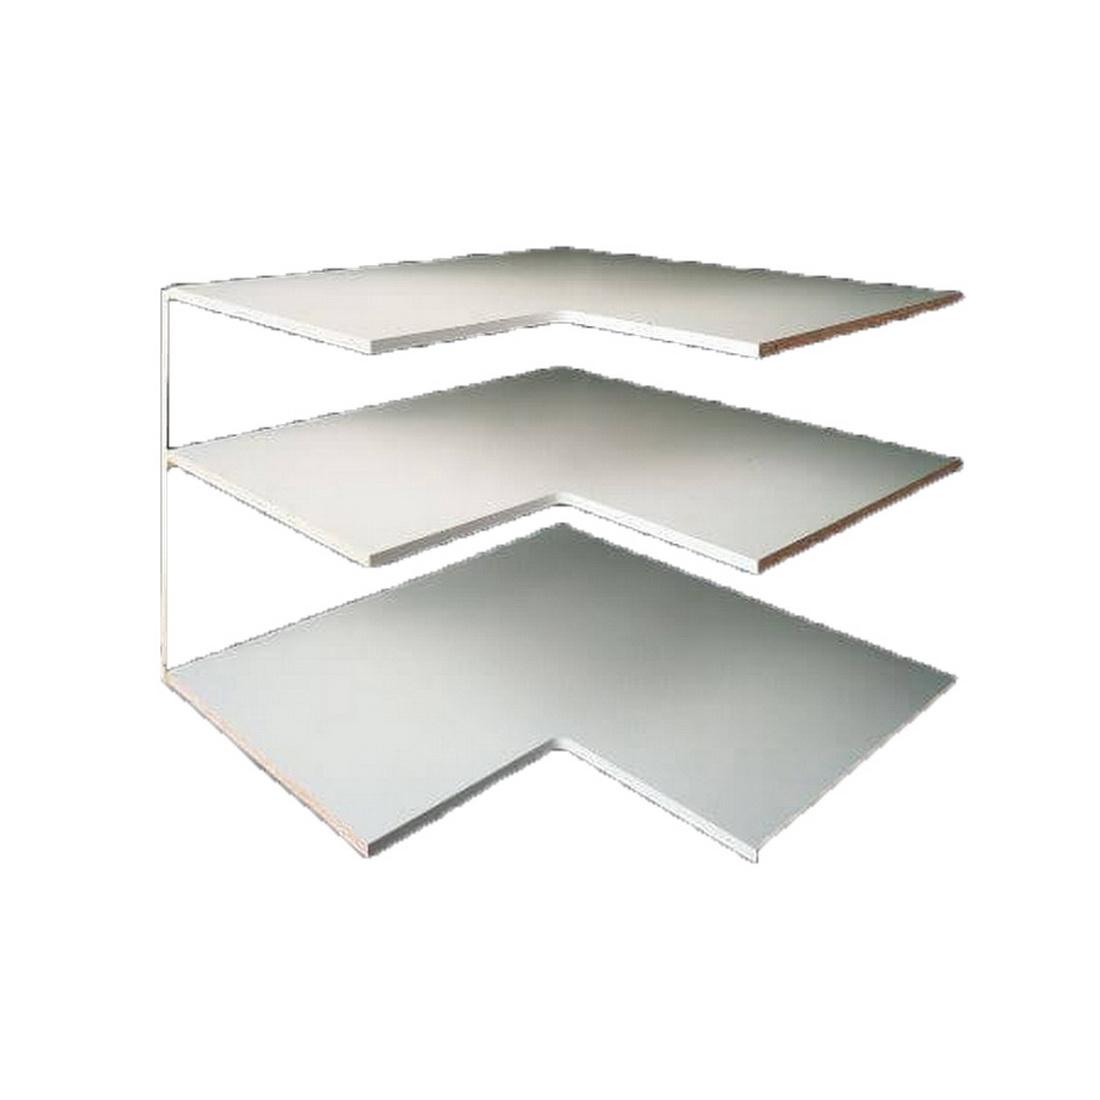 Laminex Whiteboard MDF Panel 2440 x 1220 x 9mm Satin 873366